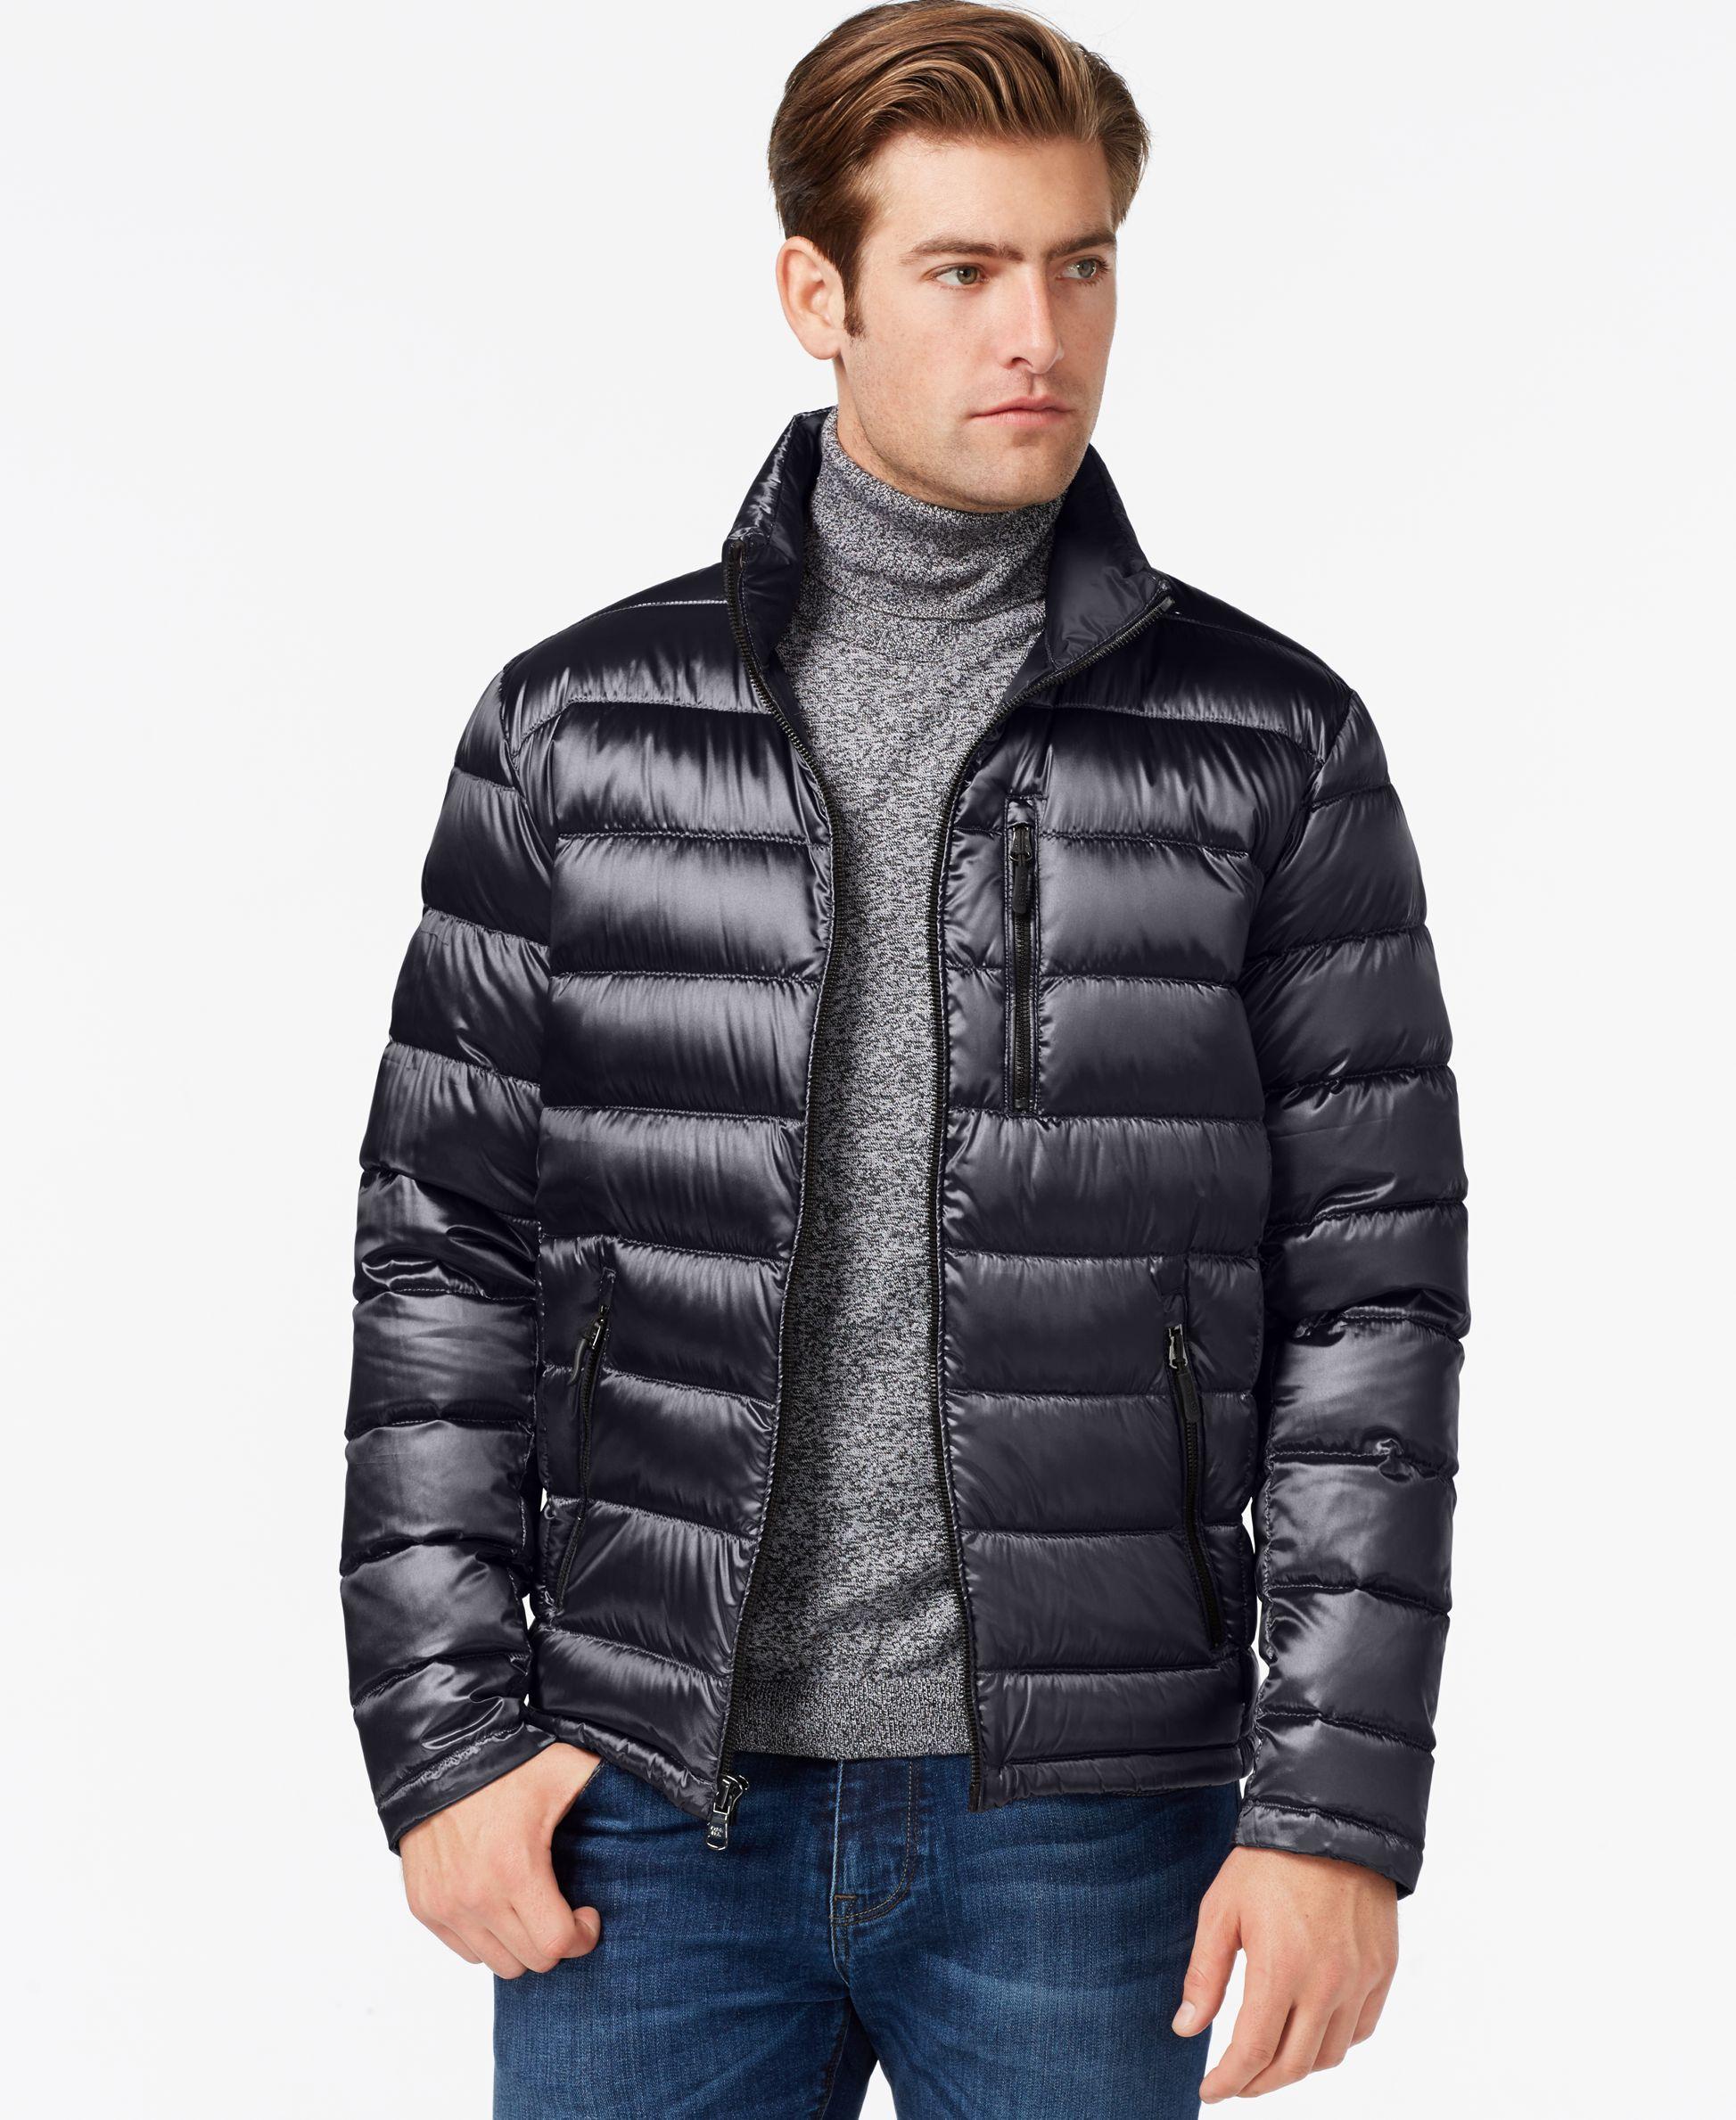 Calvin Klein Men S Degree Jacket Coats Jackets Men Macy S [ 2378 x 1947 Pixel ]